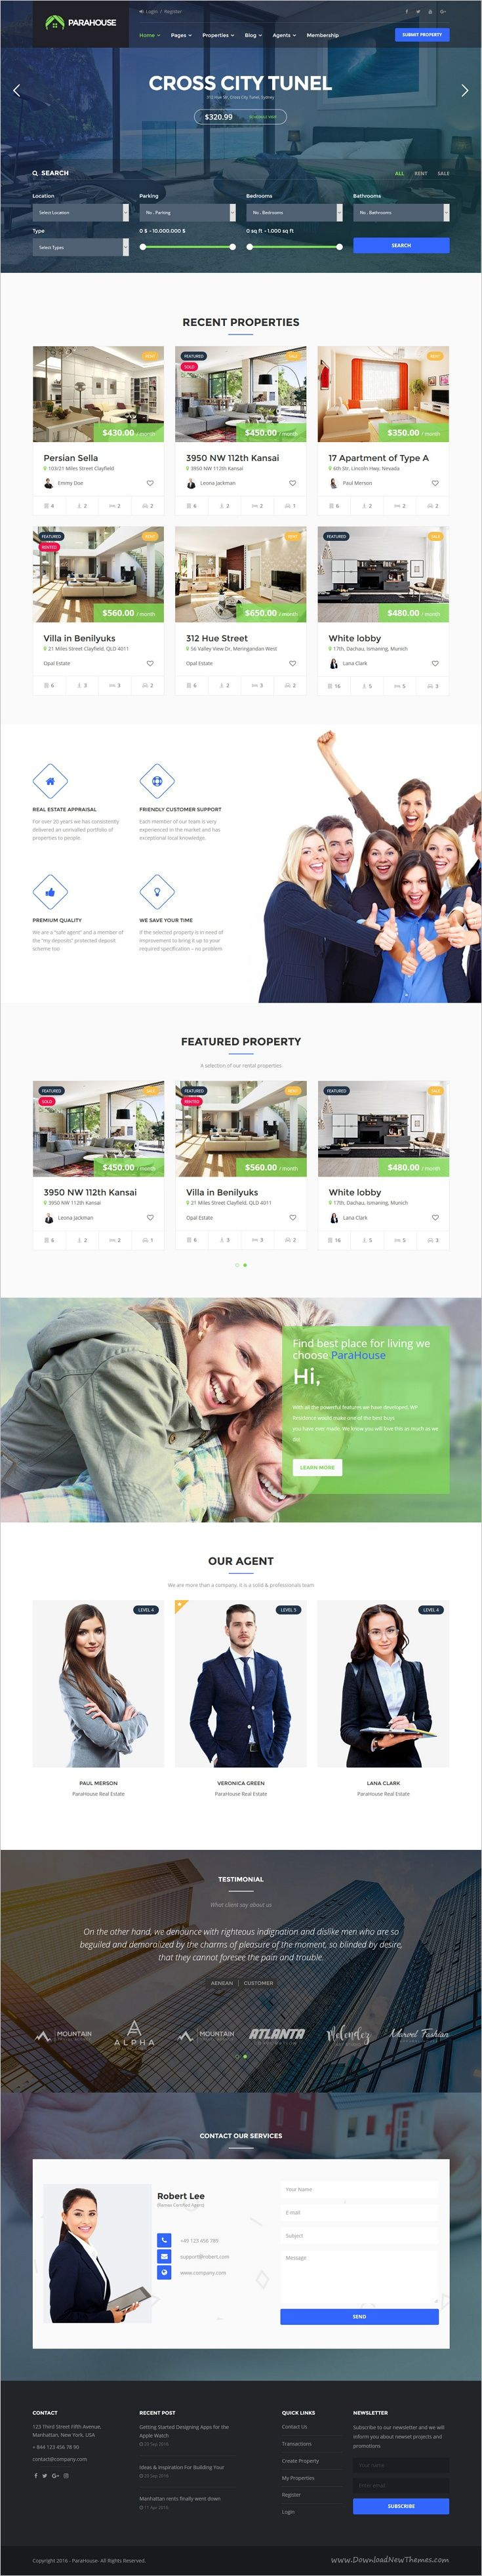 Parahouse is a wonderful responsive #WordPress theme for #realestate, Property Agents, Rent #Villa, #Apartment website download now➩ https://themeforest.net/item/parahouse-modern-real-estate-wordpress-theme/18150539?ref=Datasata